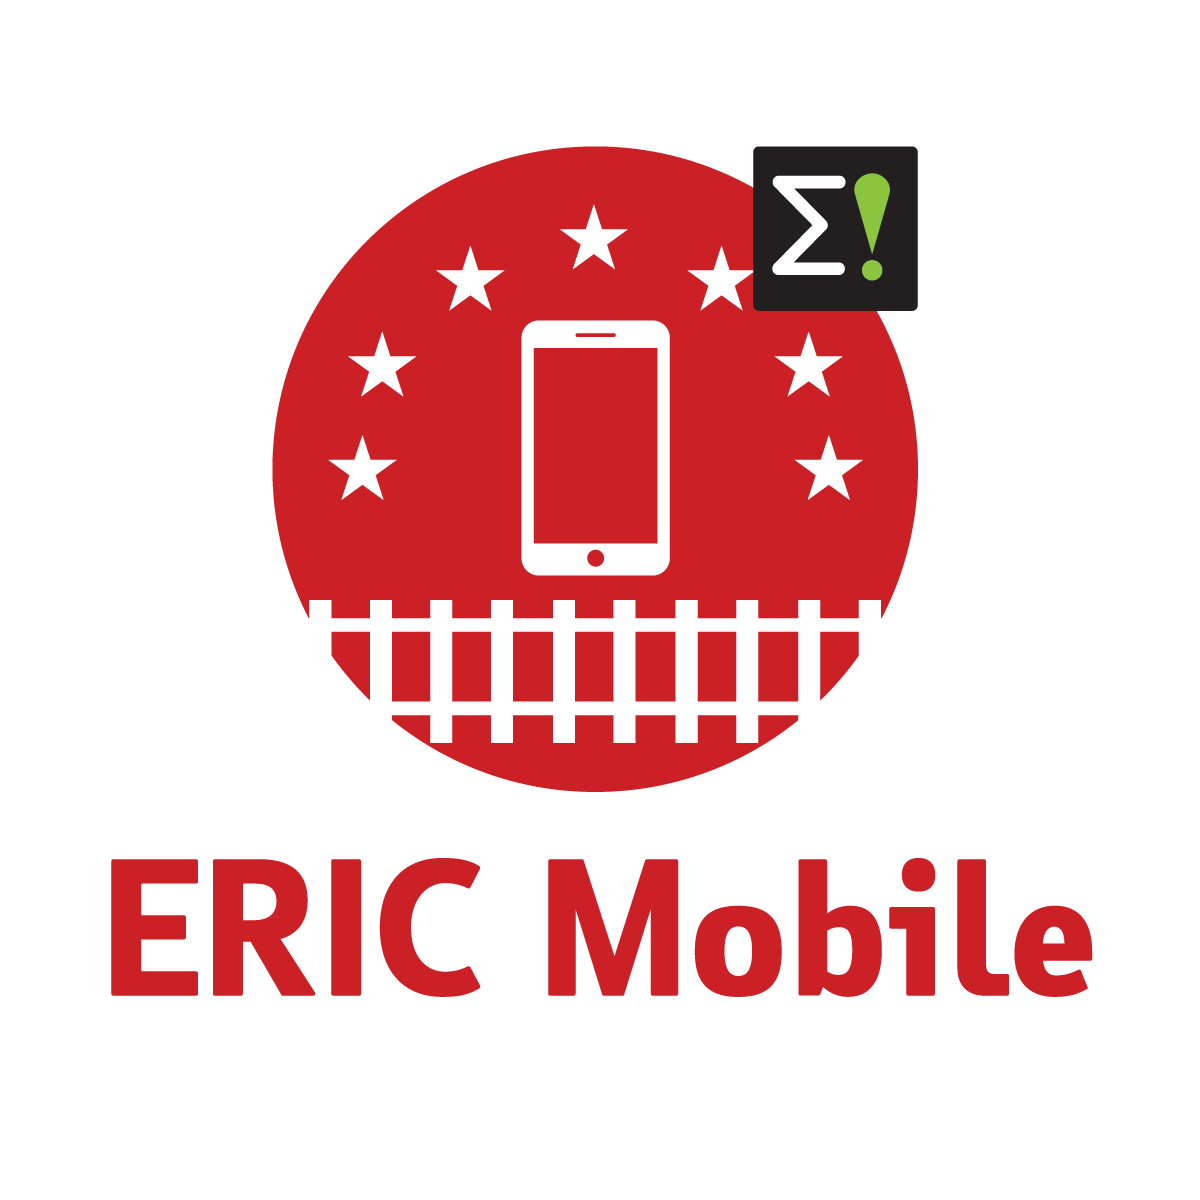 ERIC Mobile